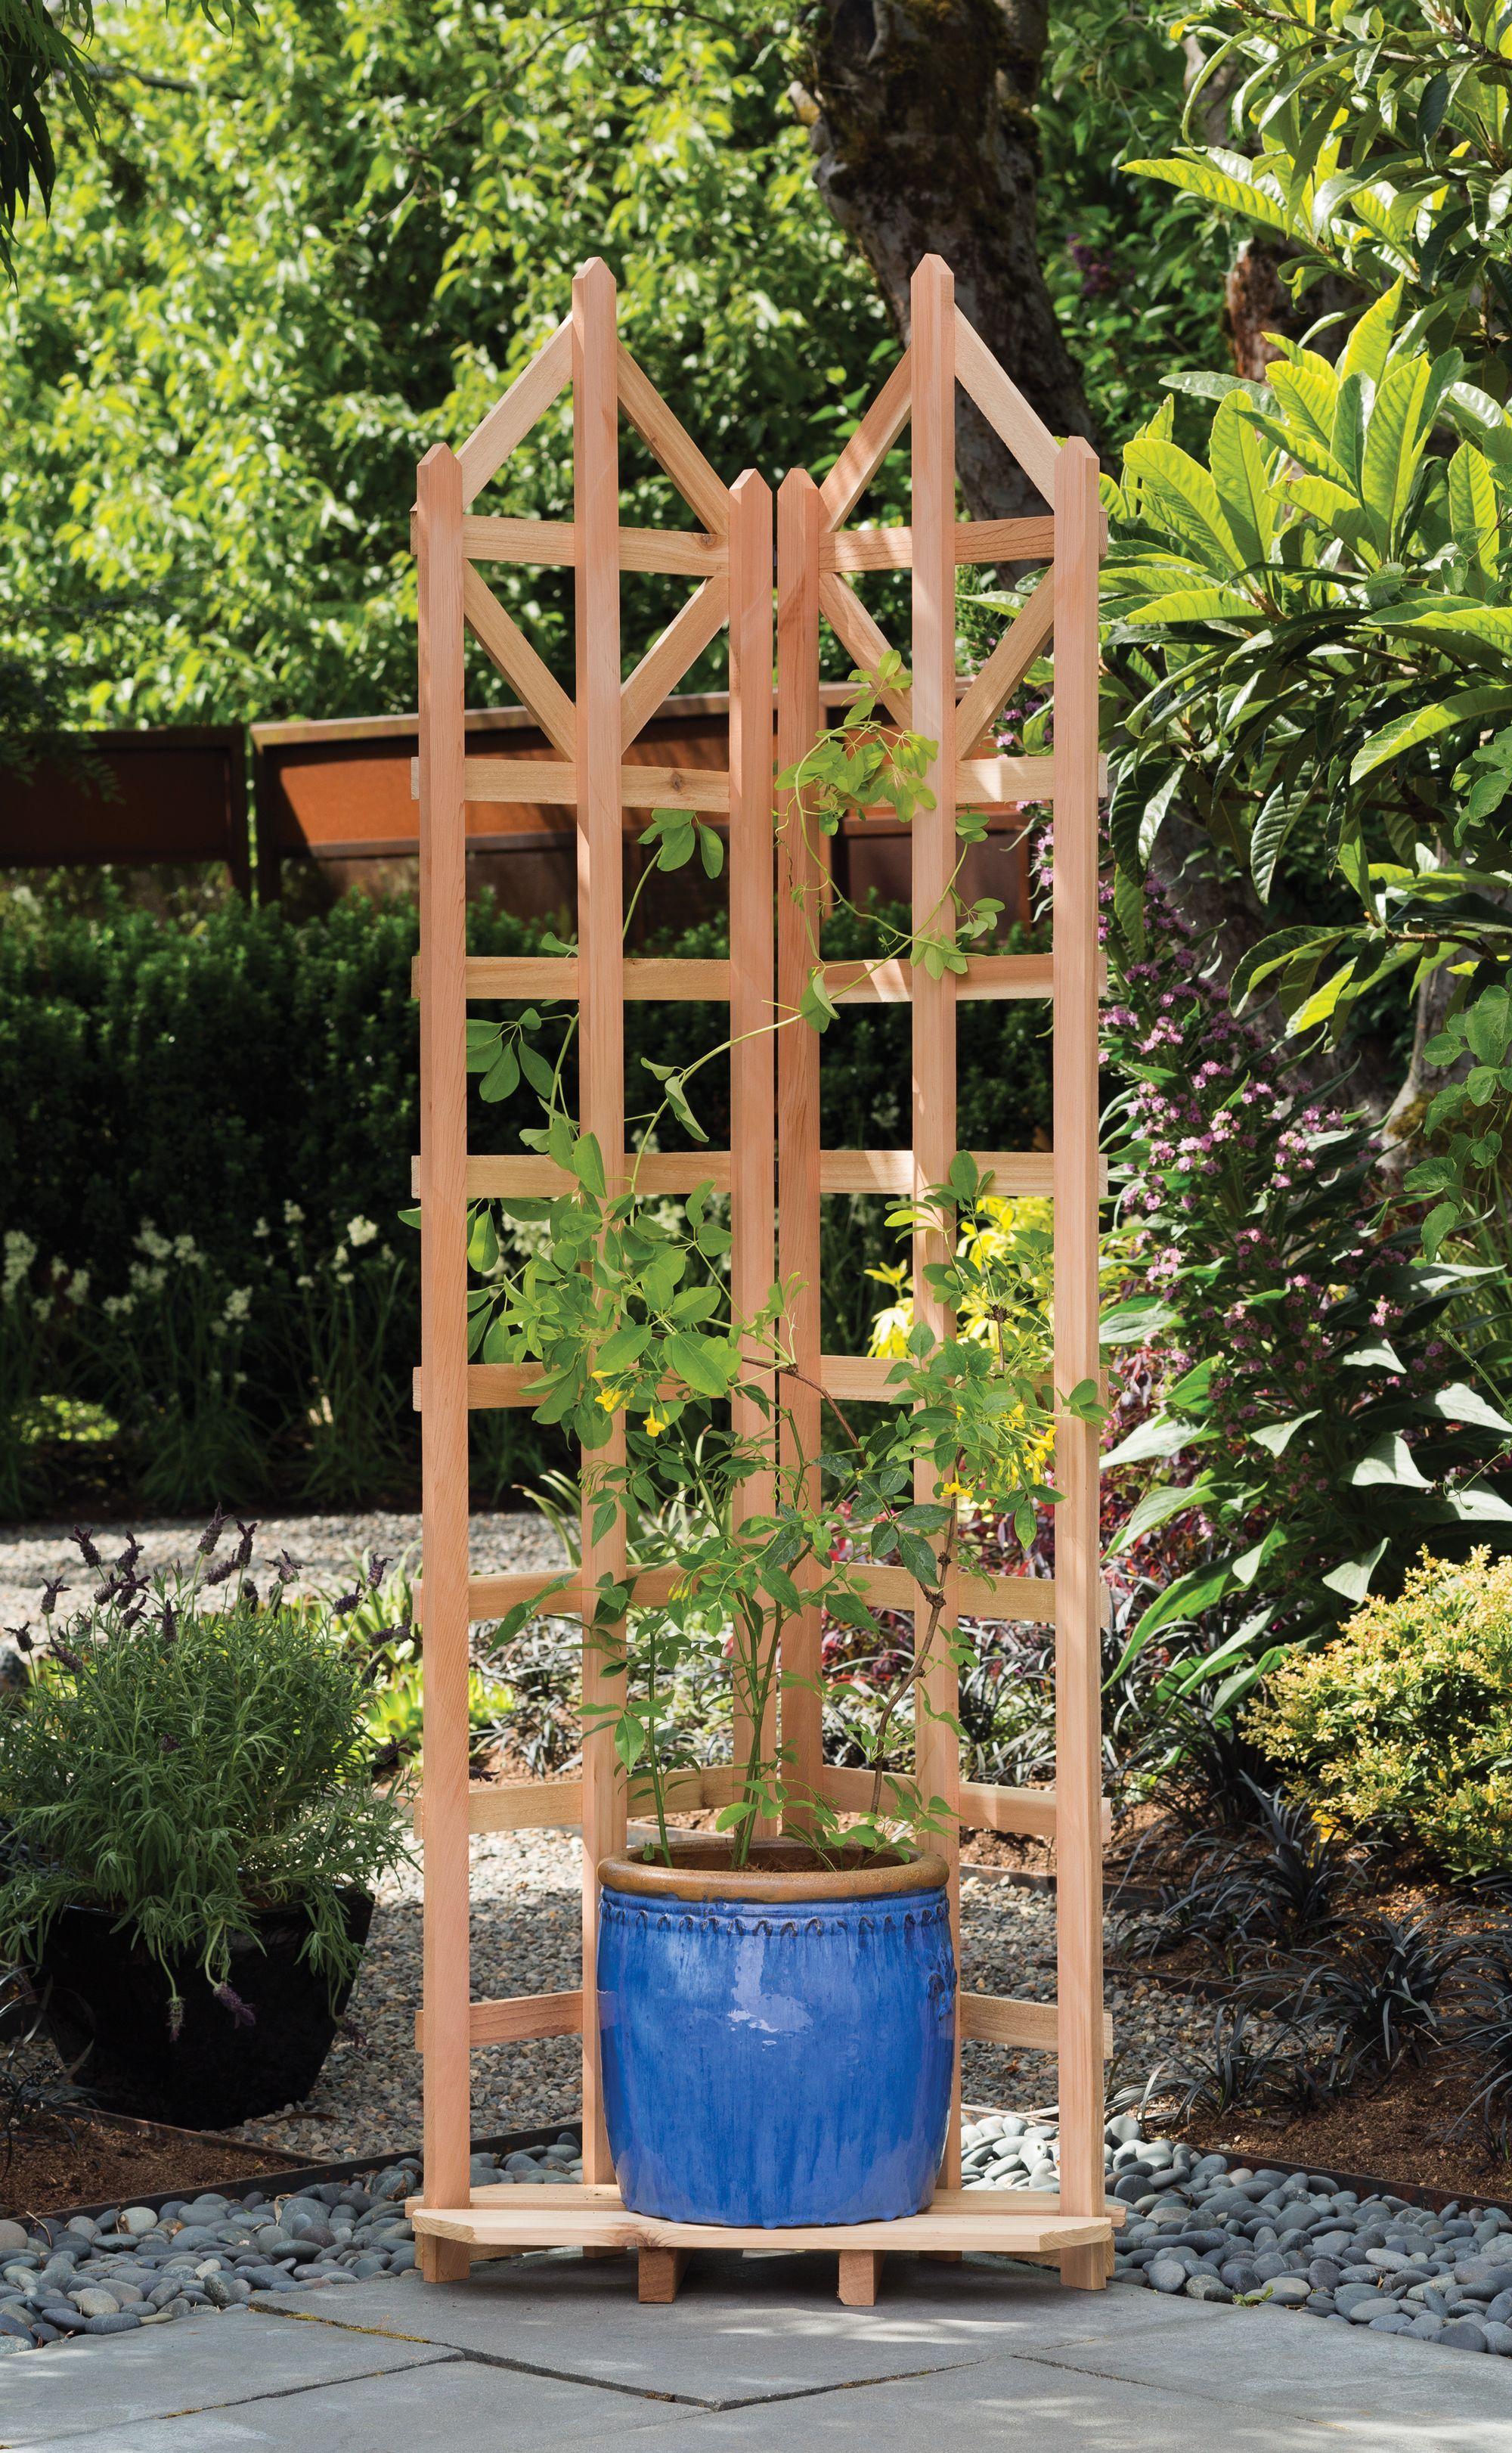 Marvelous Corner Trellis Ideas Part - 7: Wood Trellis: Deco Freestanding Corner Trellis | Gardeners.com